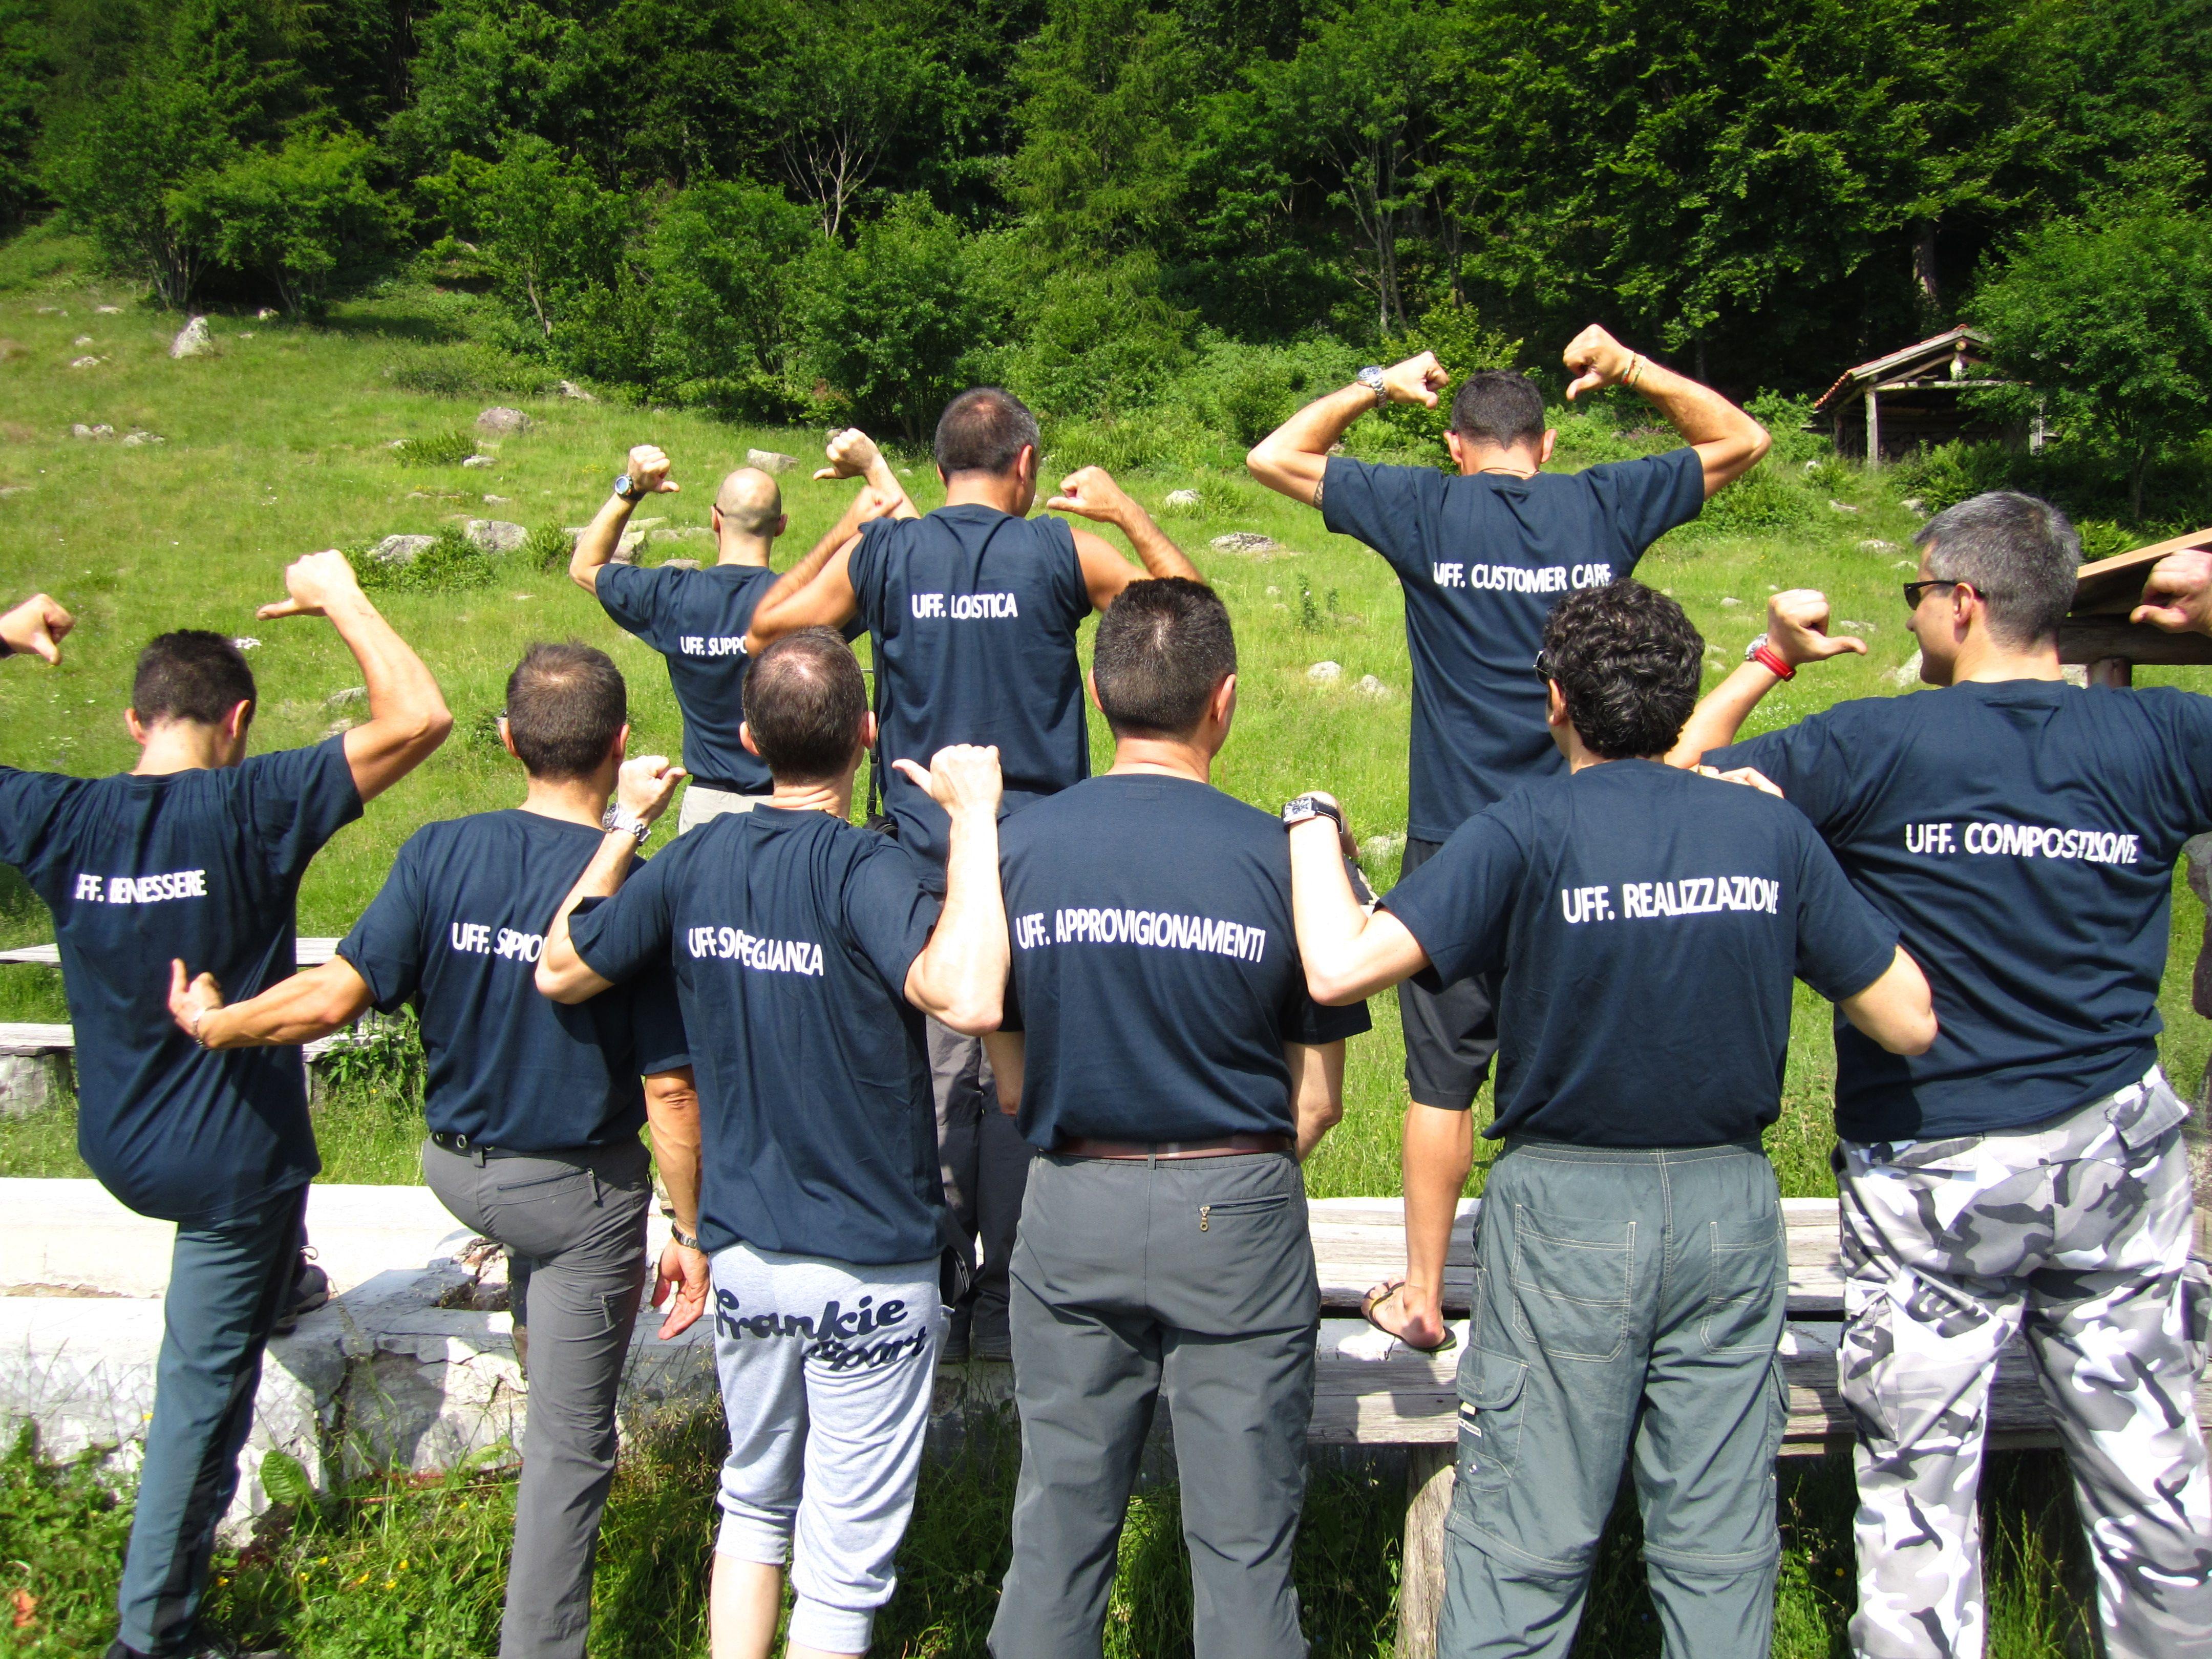 30 jun 2012 - REDAELLI Tecna - TEAMBUILDING with ALTEA - Capanna Remedio (1446 Mt.), prealpi bresciane